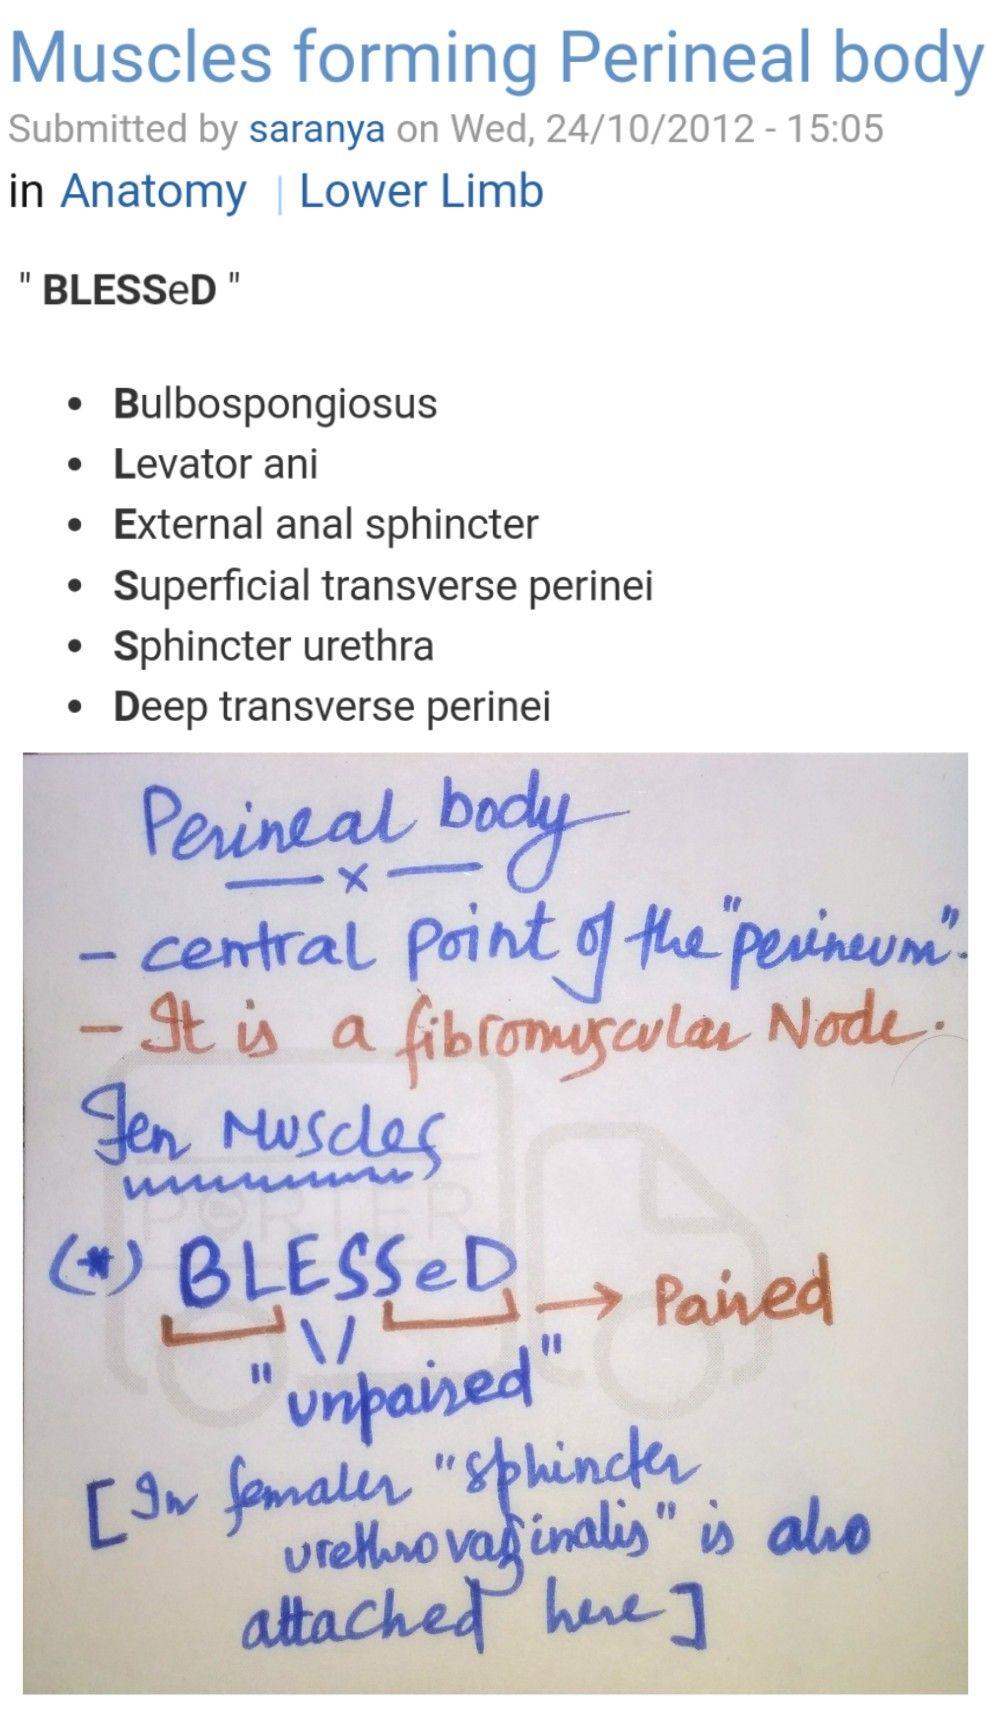 Perineal body ... ( Note: Bulbospongiosus & \